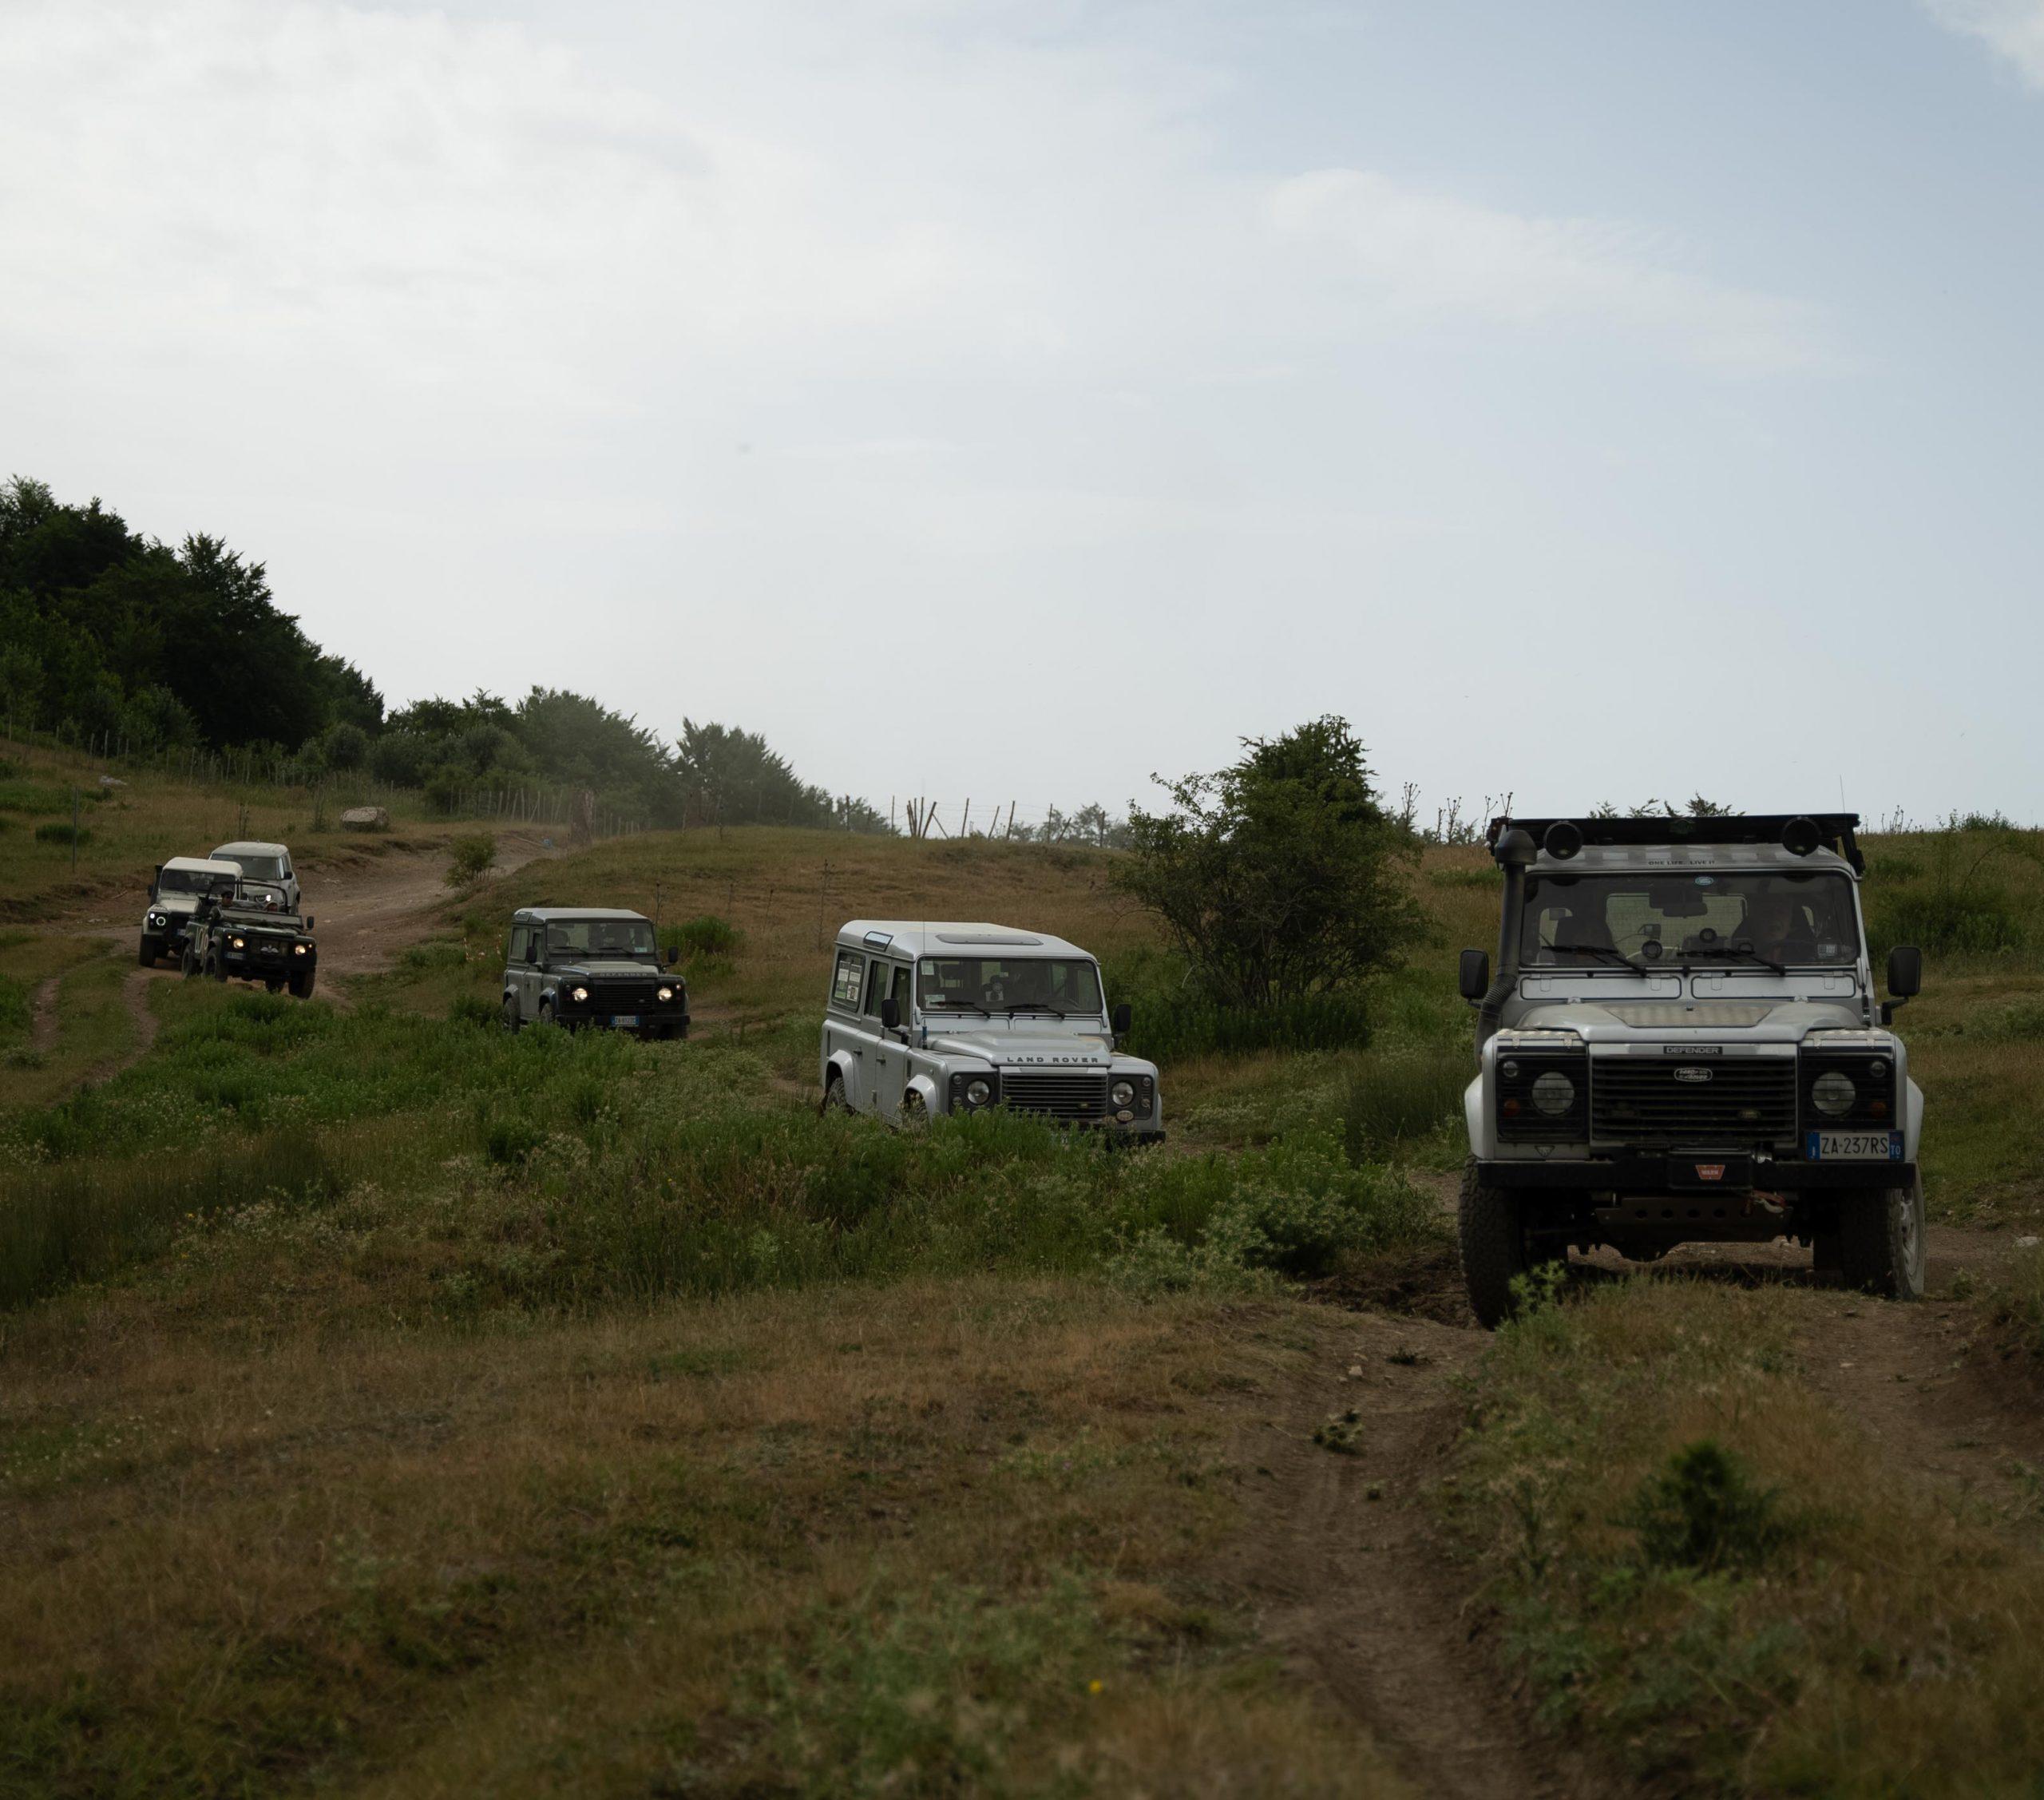 Land_Rover_Tour_Sicilia_2021_Land_Rover_Experience_Italia_-74